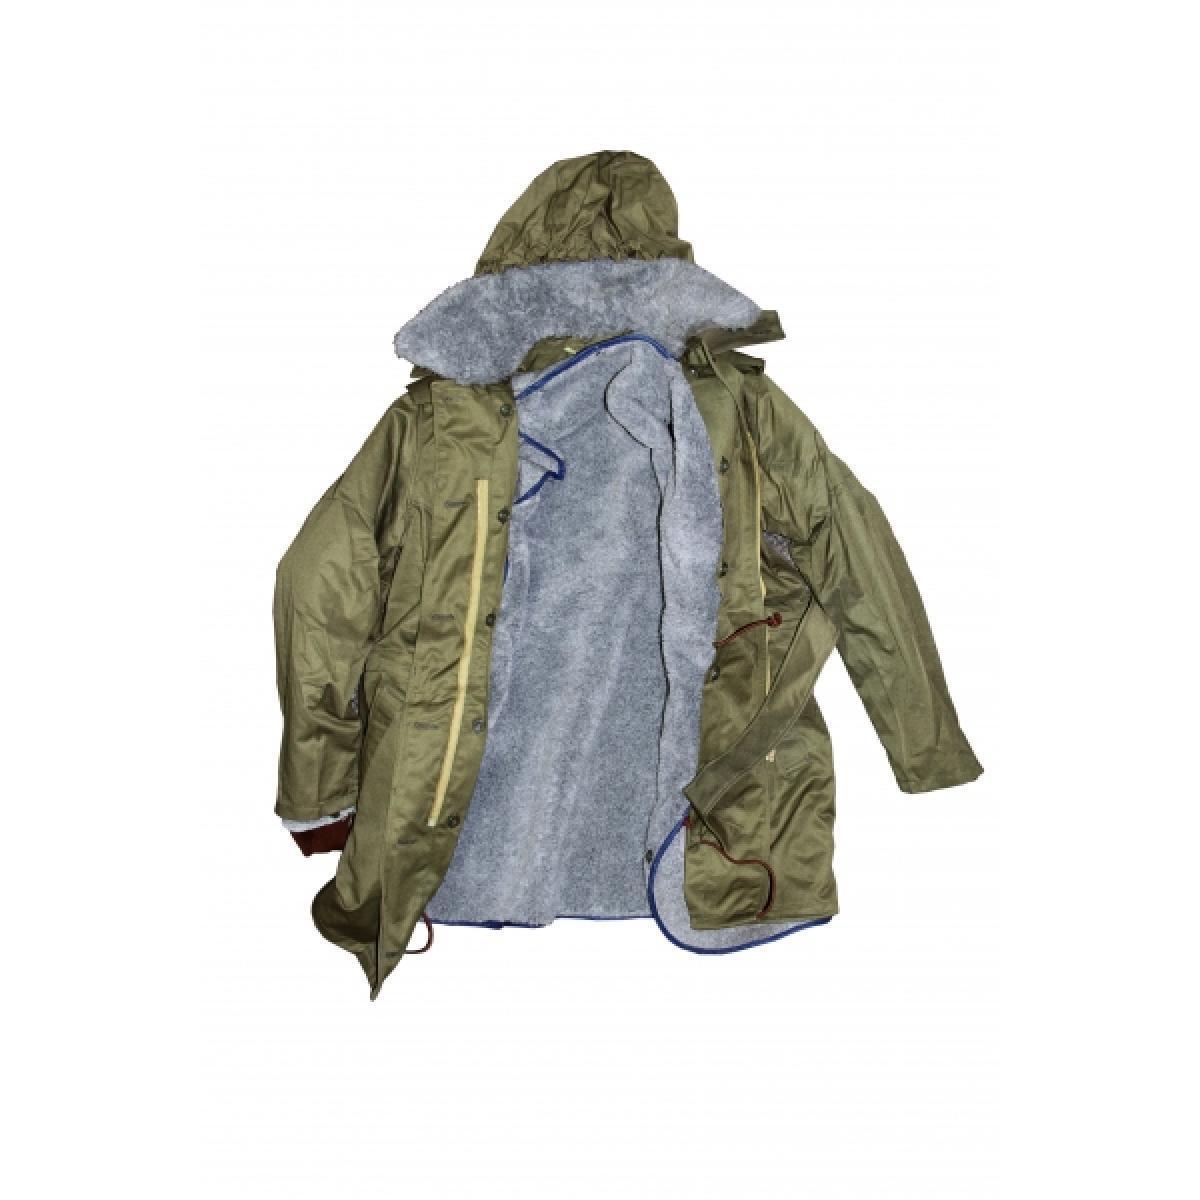 Genuine Czech Military Surplus Top Quality Parka w/ liner, hood & fur collar,New